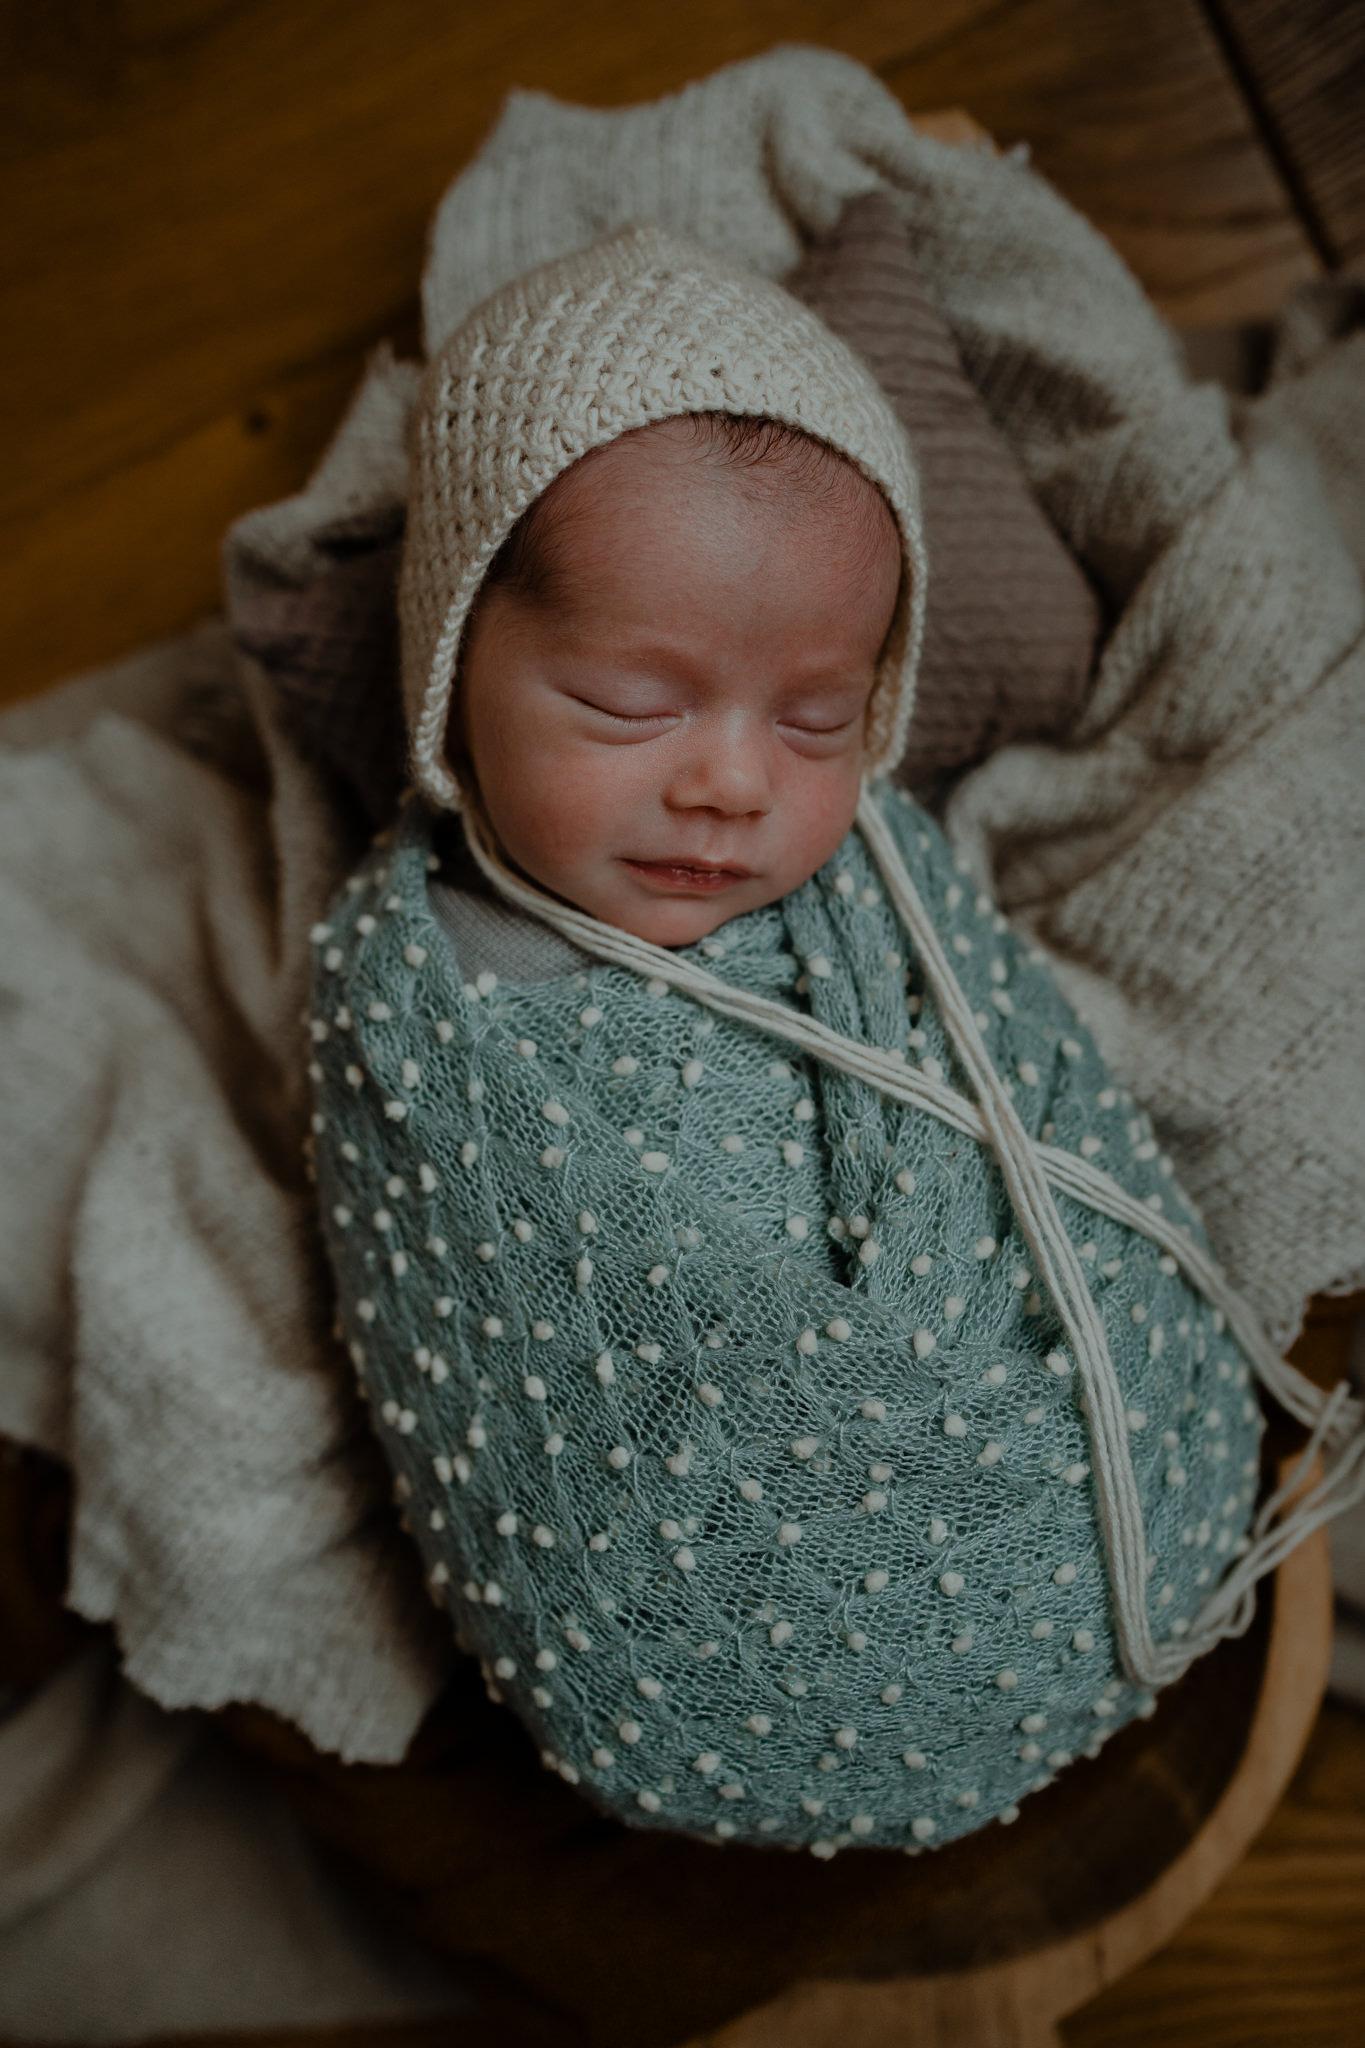 cute baby boy in bonnet and blue wrap